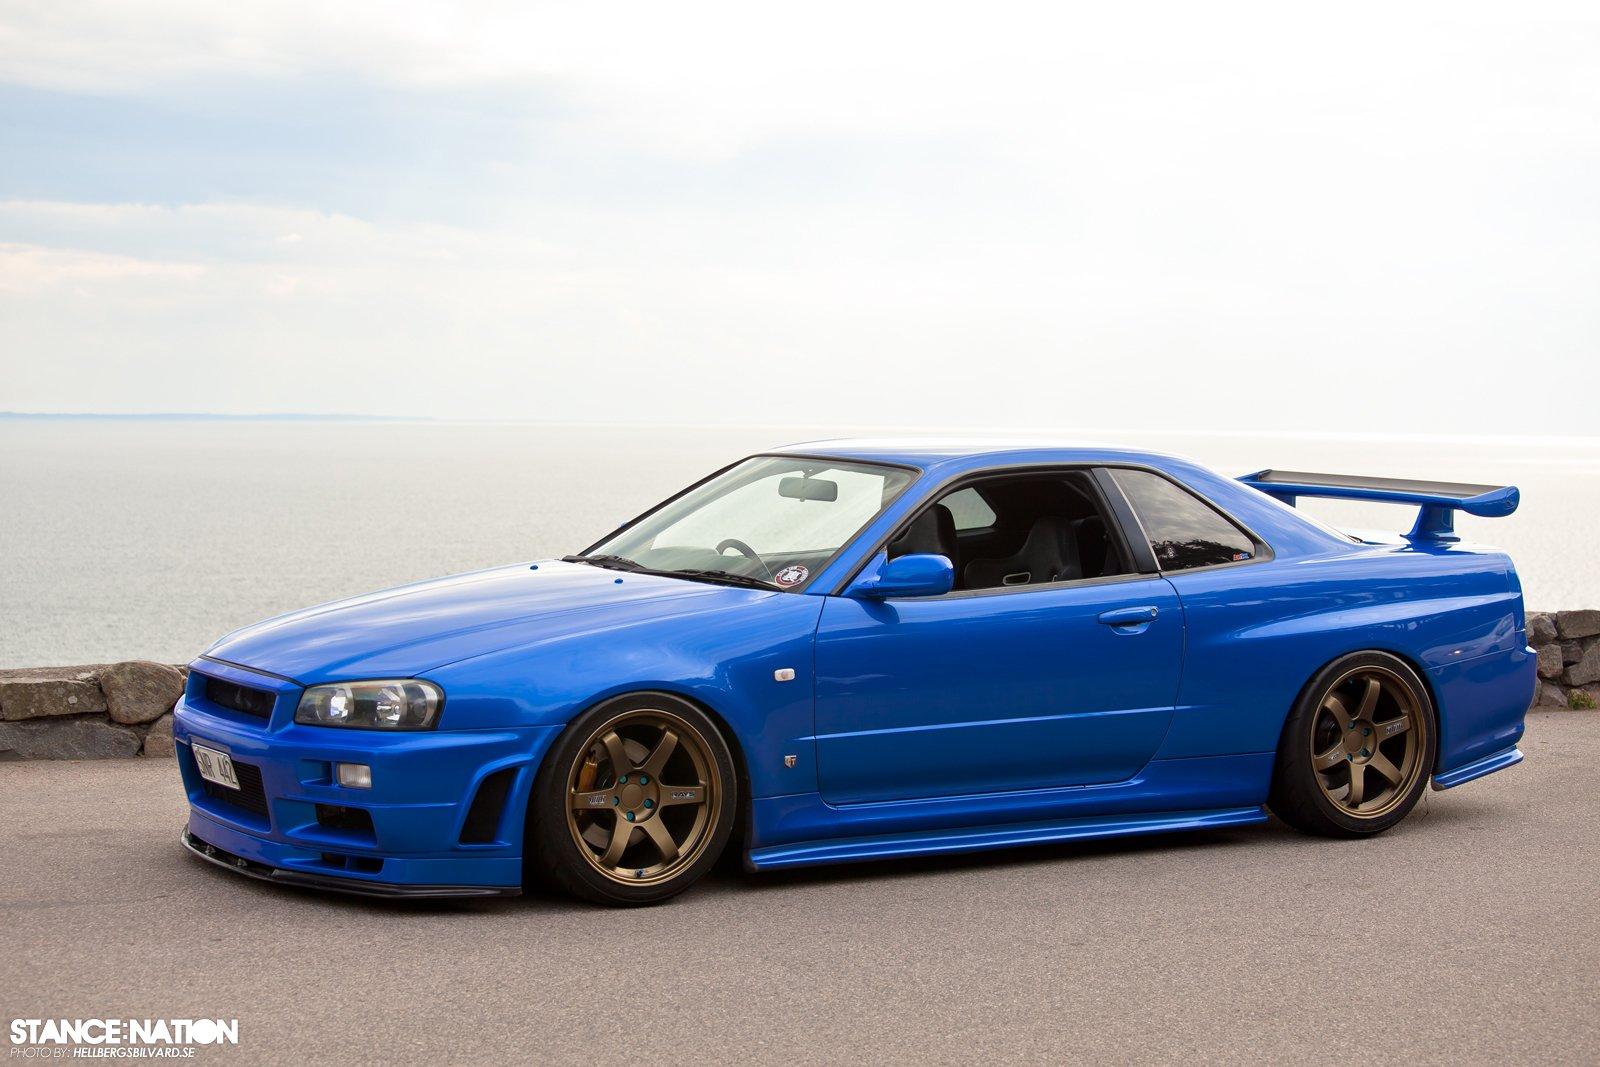 2001 Nissan Skyline R34 Gt R Tuning Custom Supercar Wallpaper 1600x1067 847710 Wallpaperup